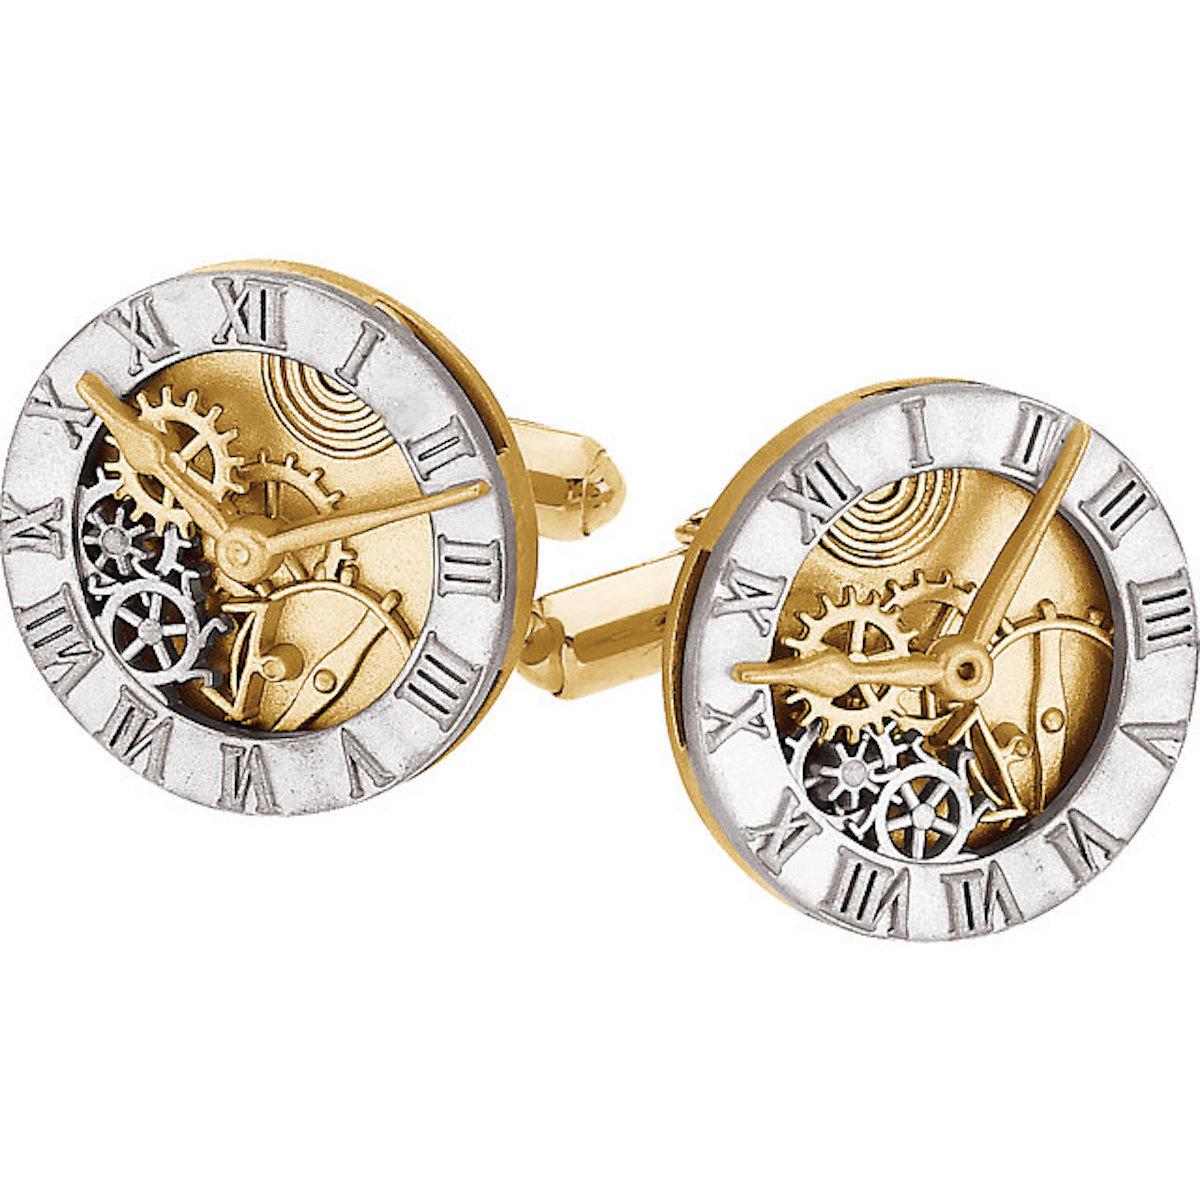 Timepiece Cuff Links